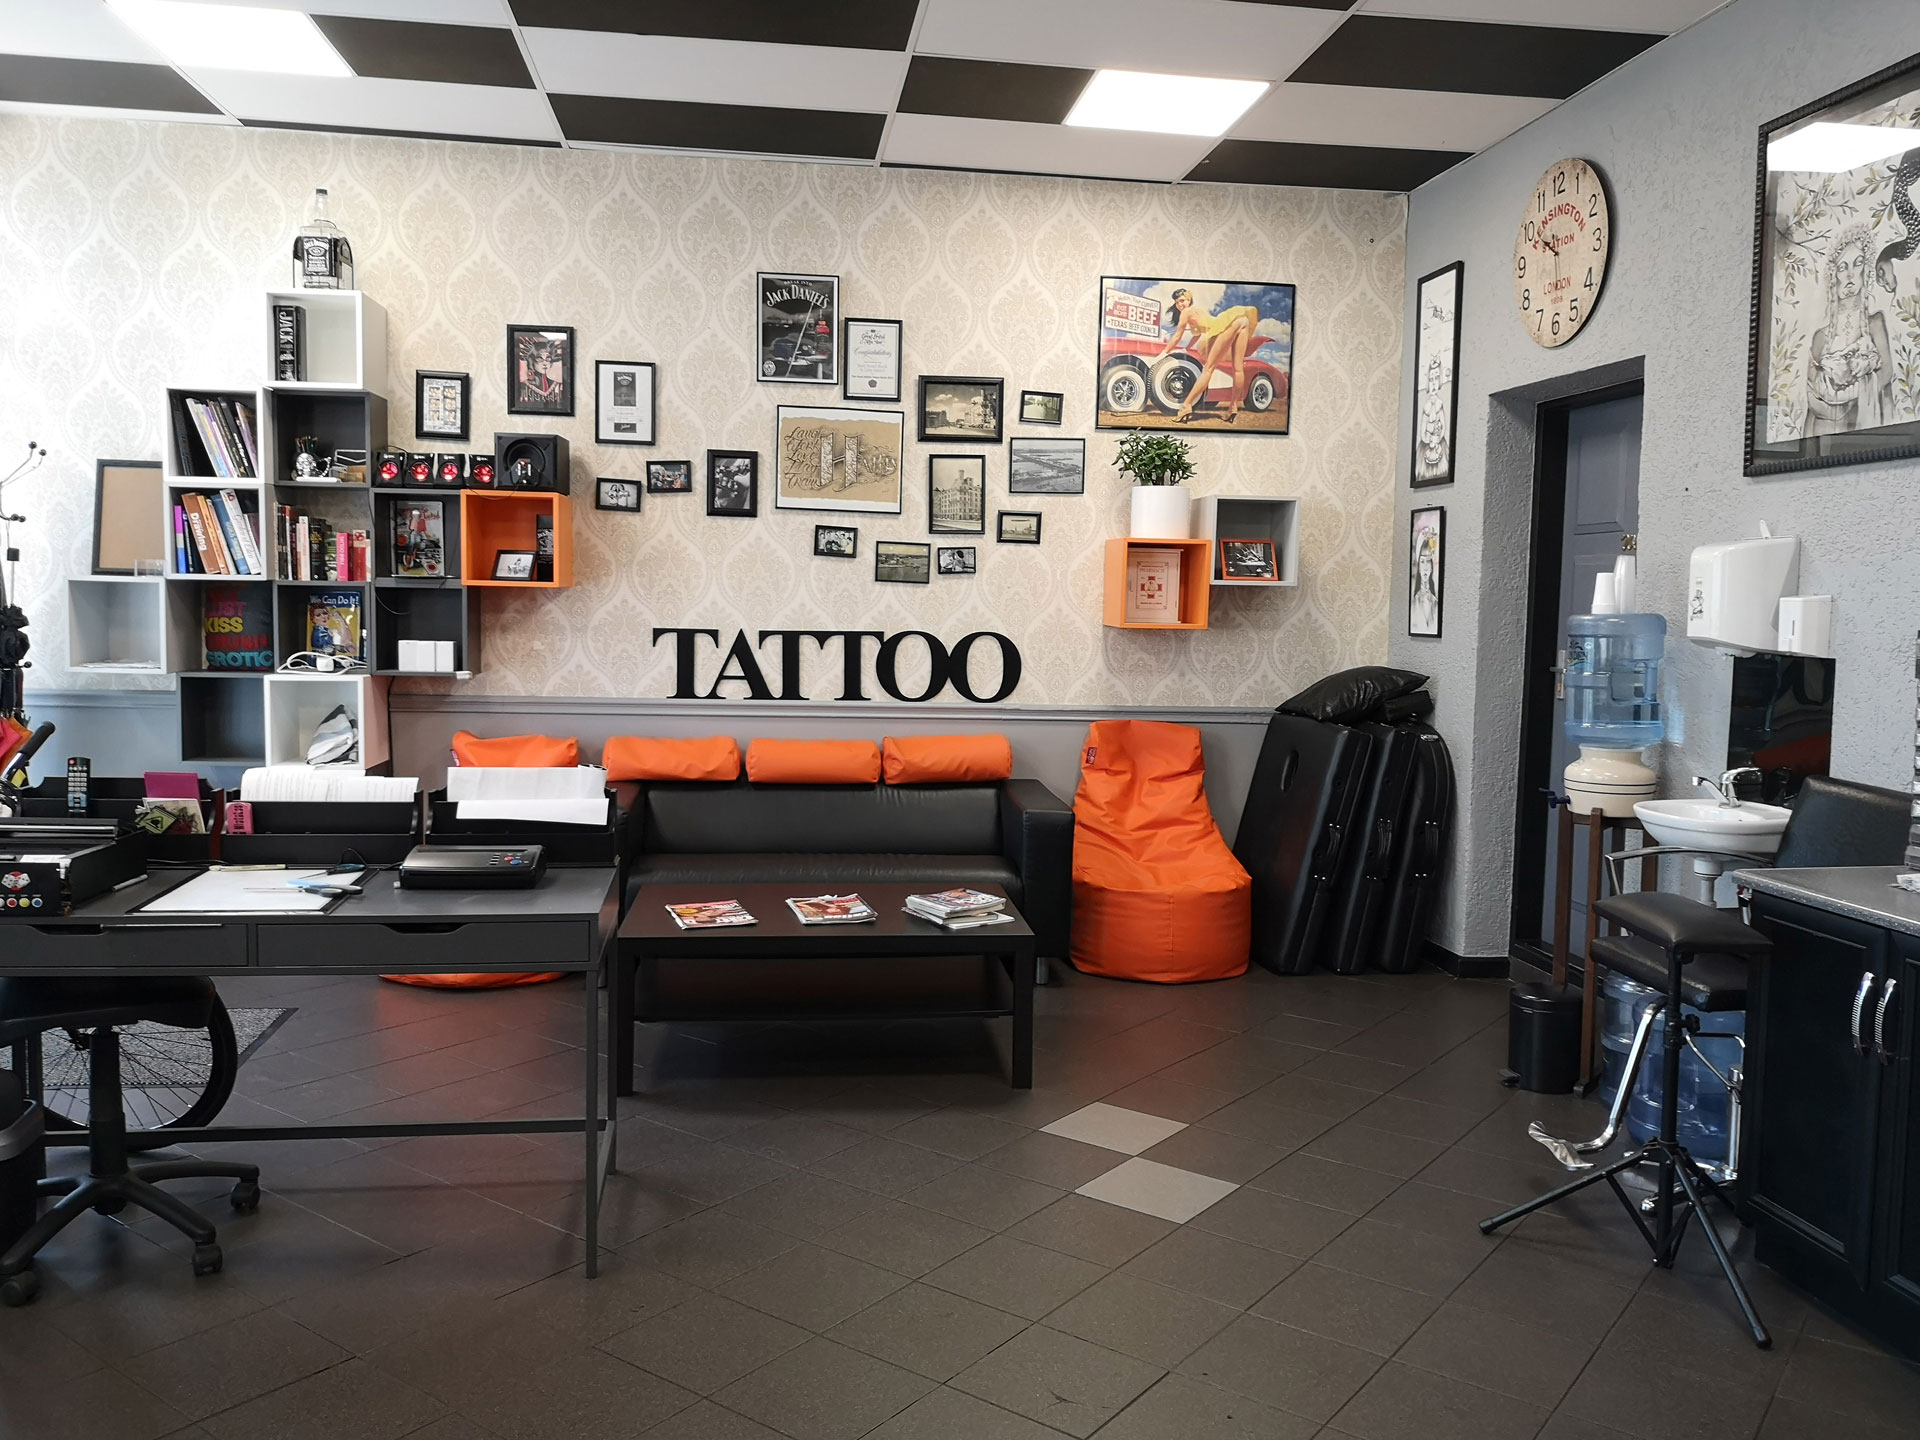 Tattoo studio in Riga - Collective Art & Tattoo Studio